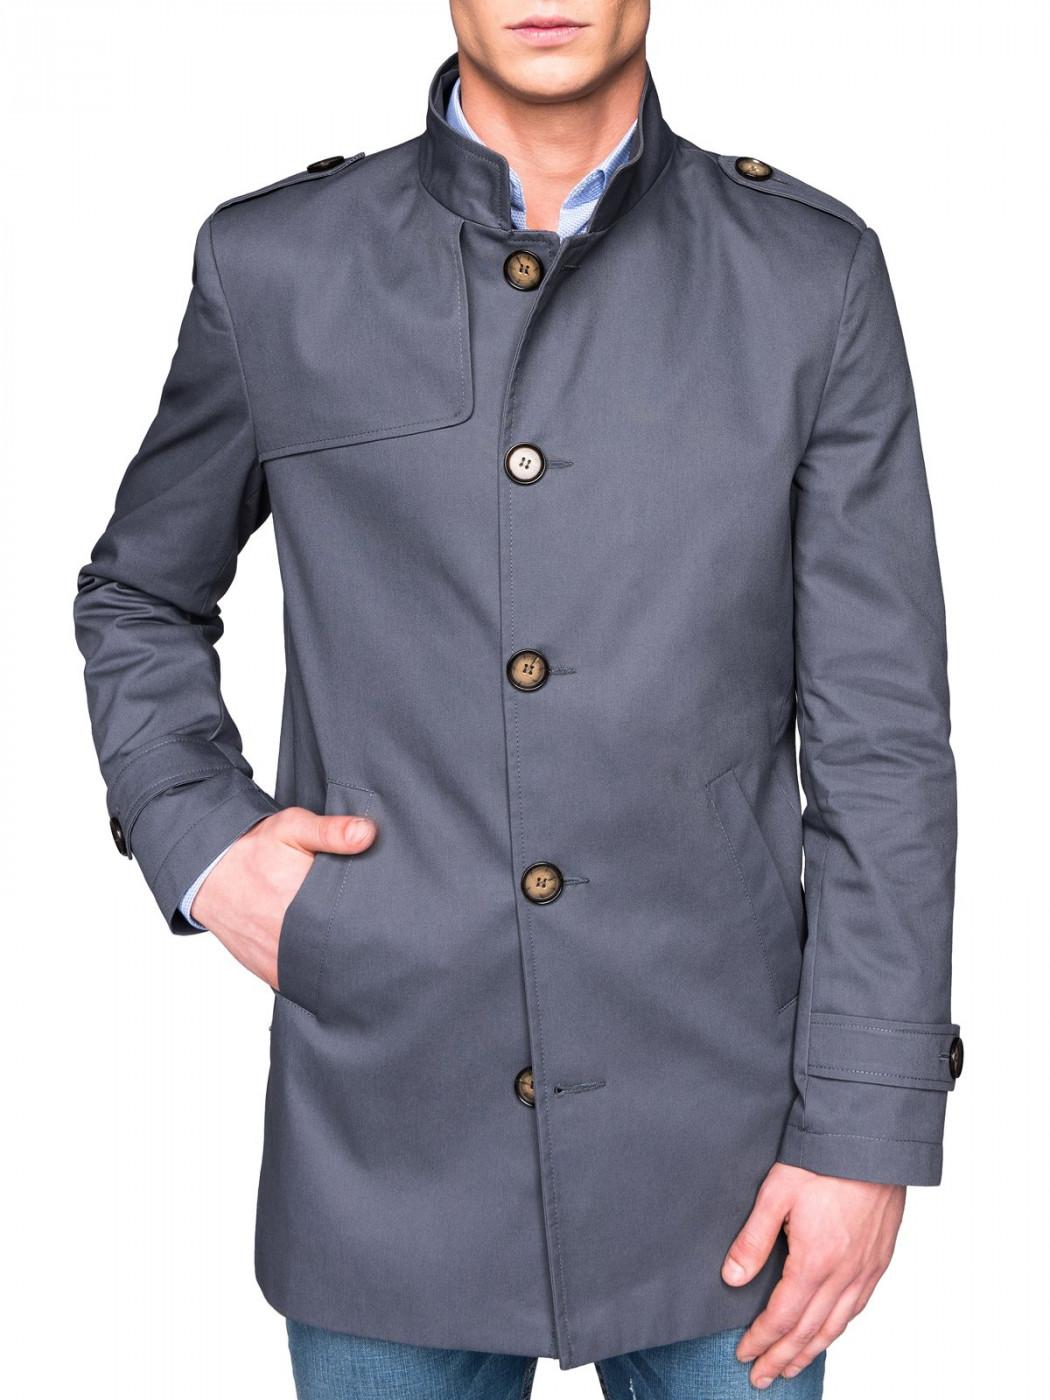 Ombre Clothing Men's mid-season coat C269